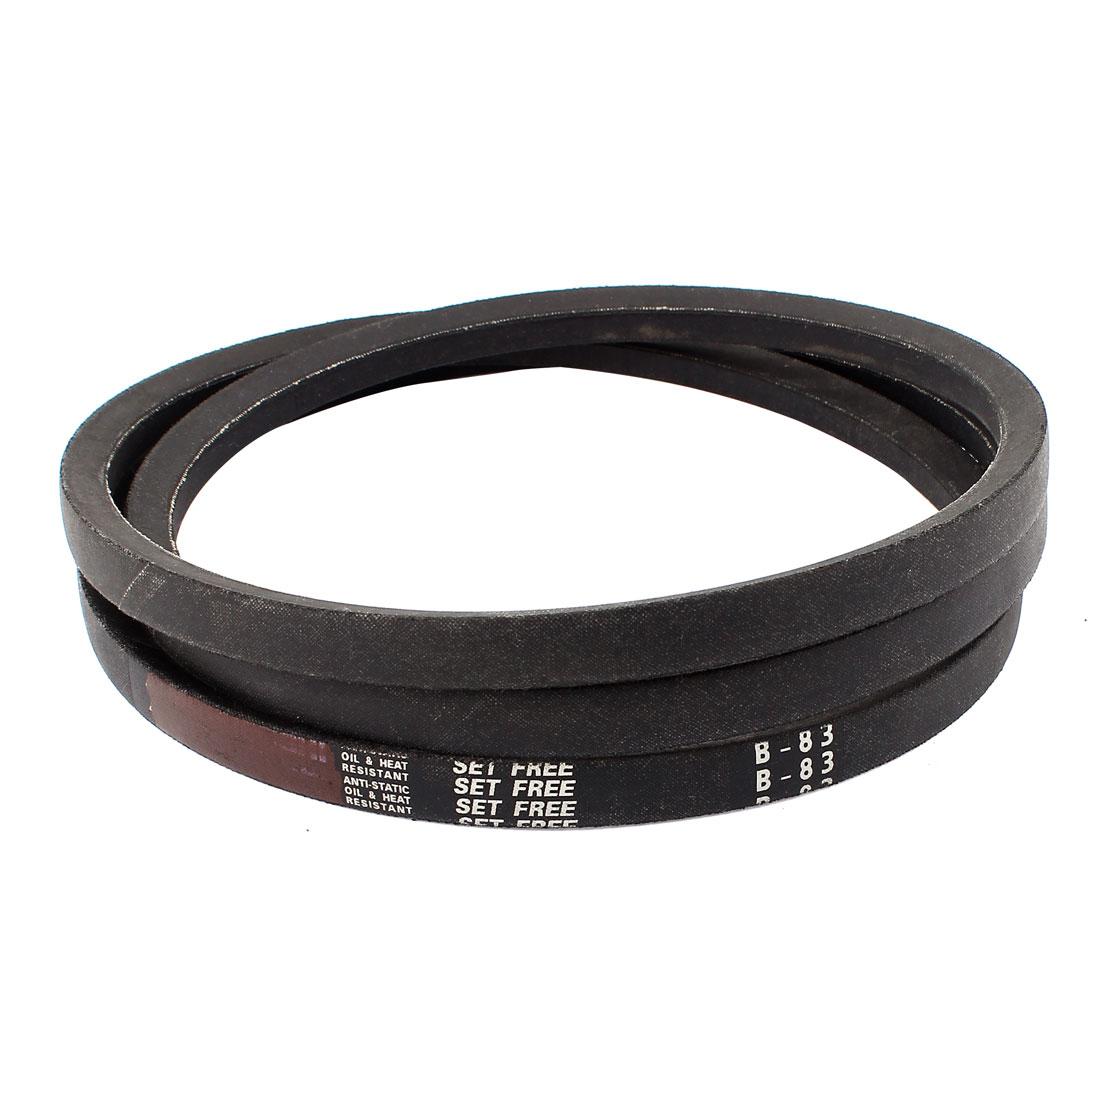 "Industrial Power Drive B83 B Section Rubber V Belt 5/8"" x 83"" Black"